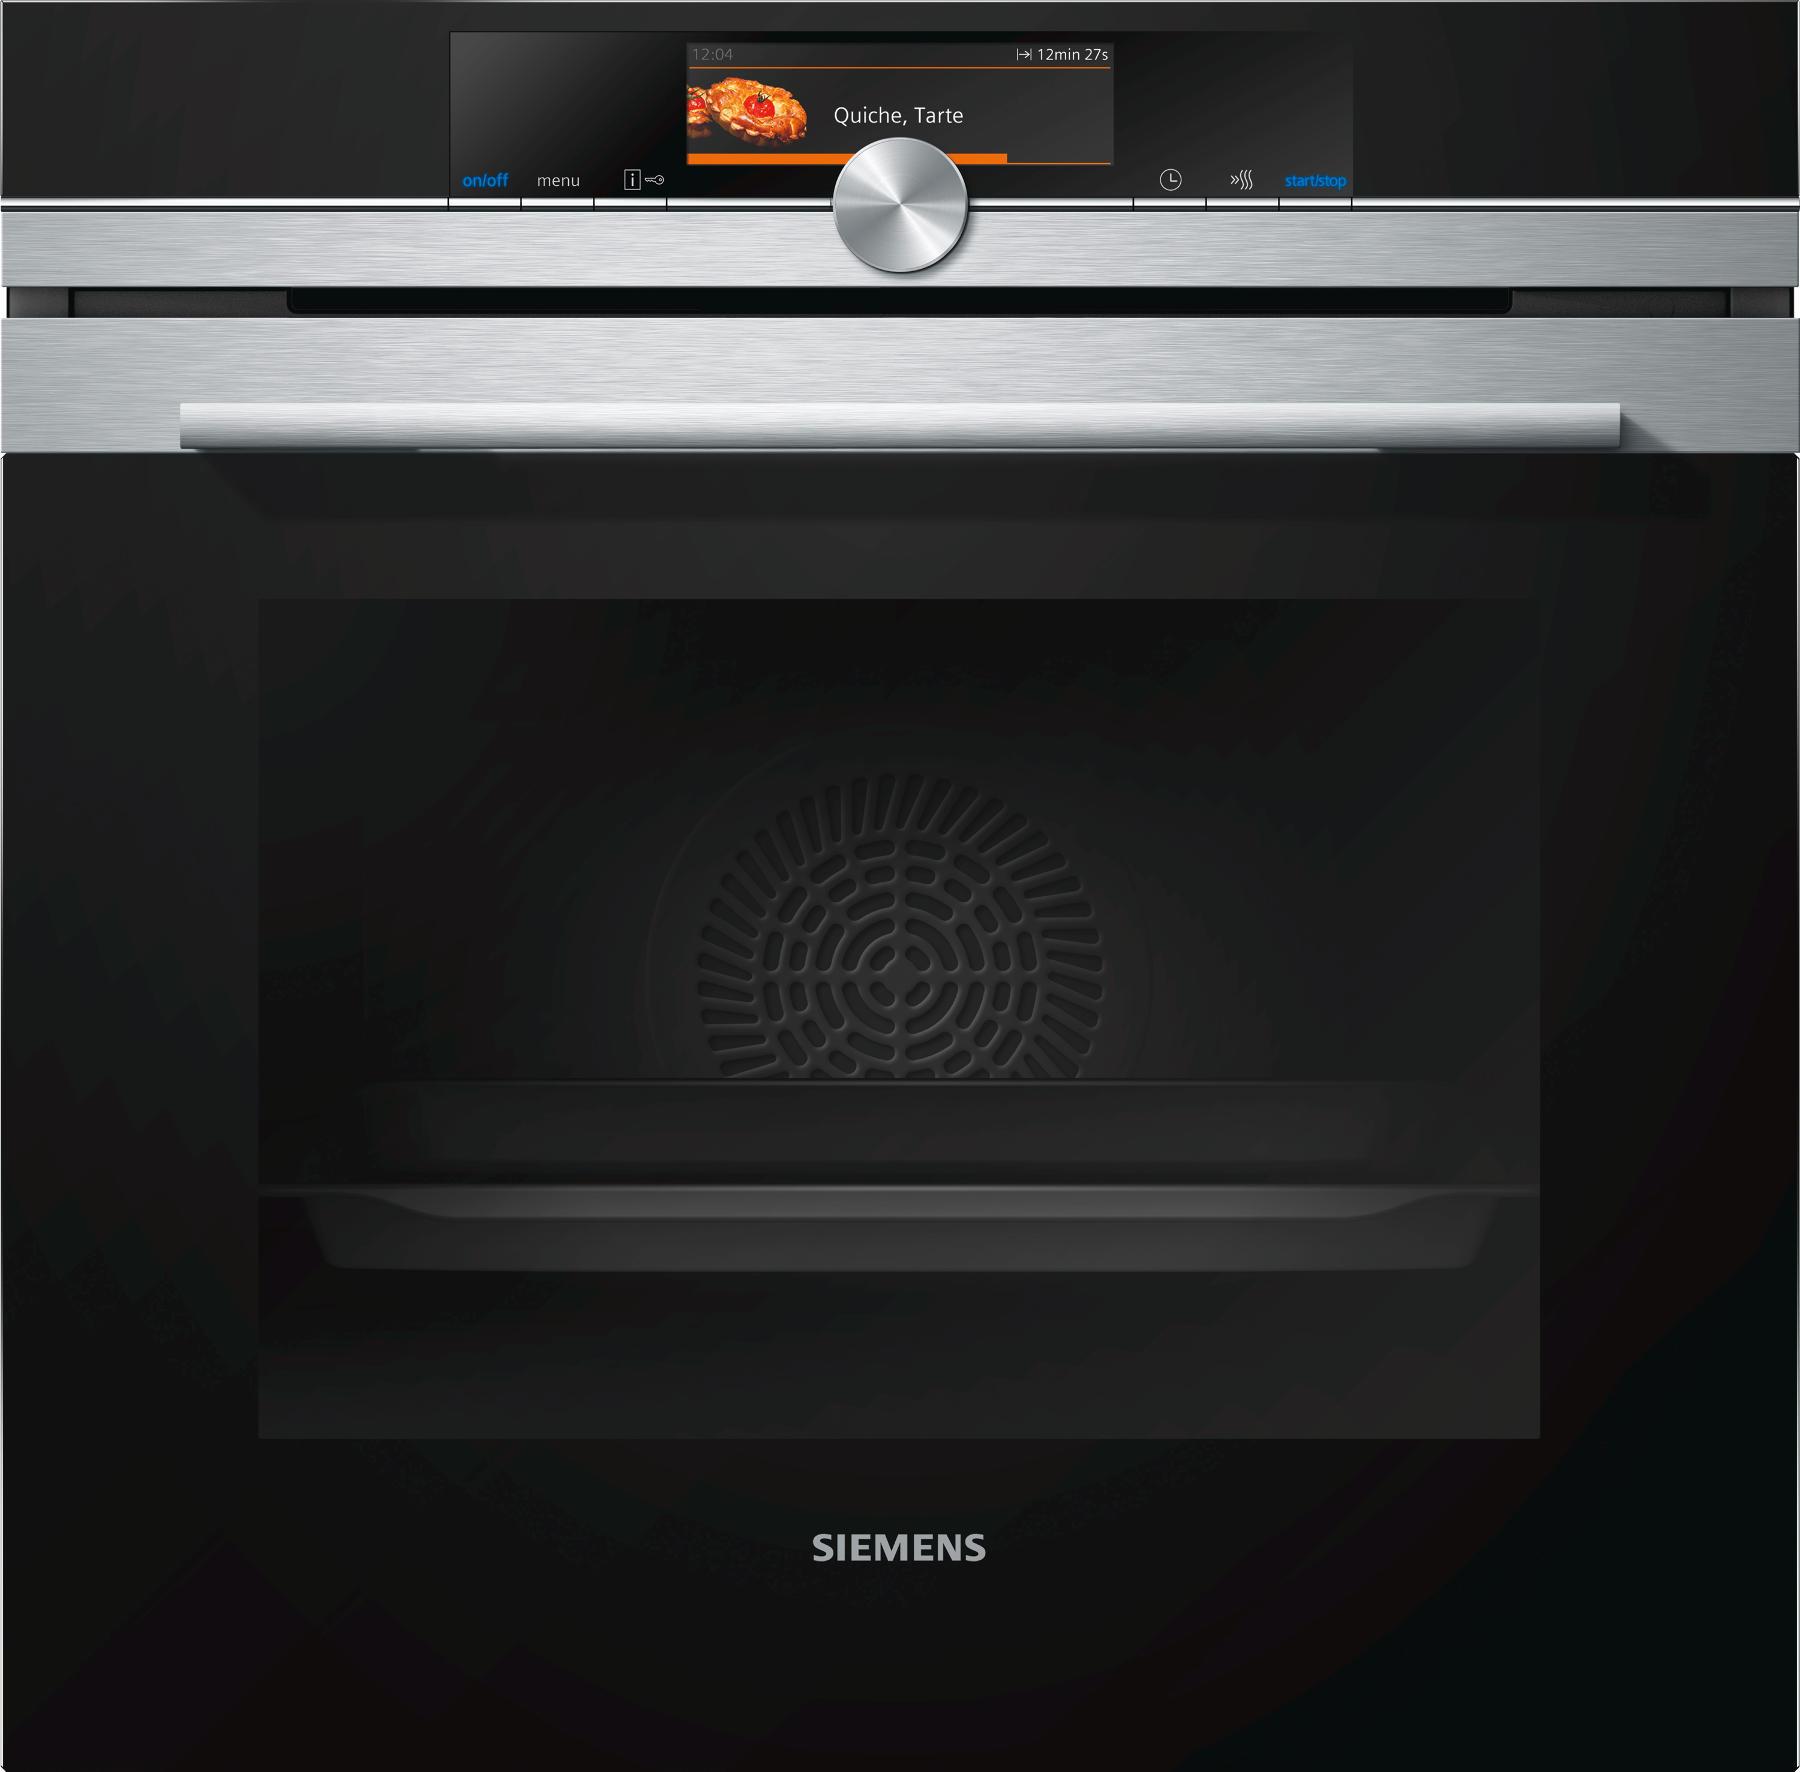 Siemens HB678GBS6B iQ700 Single Oven